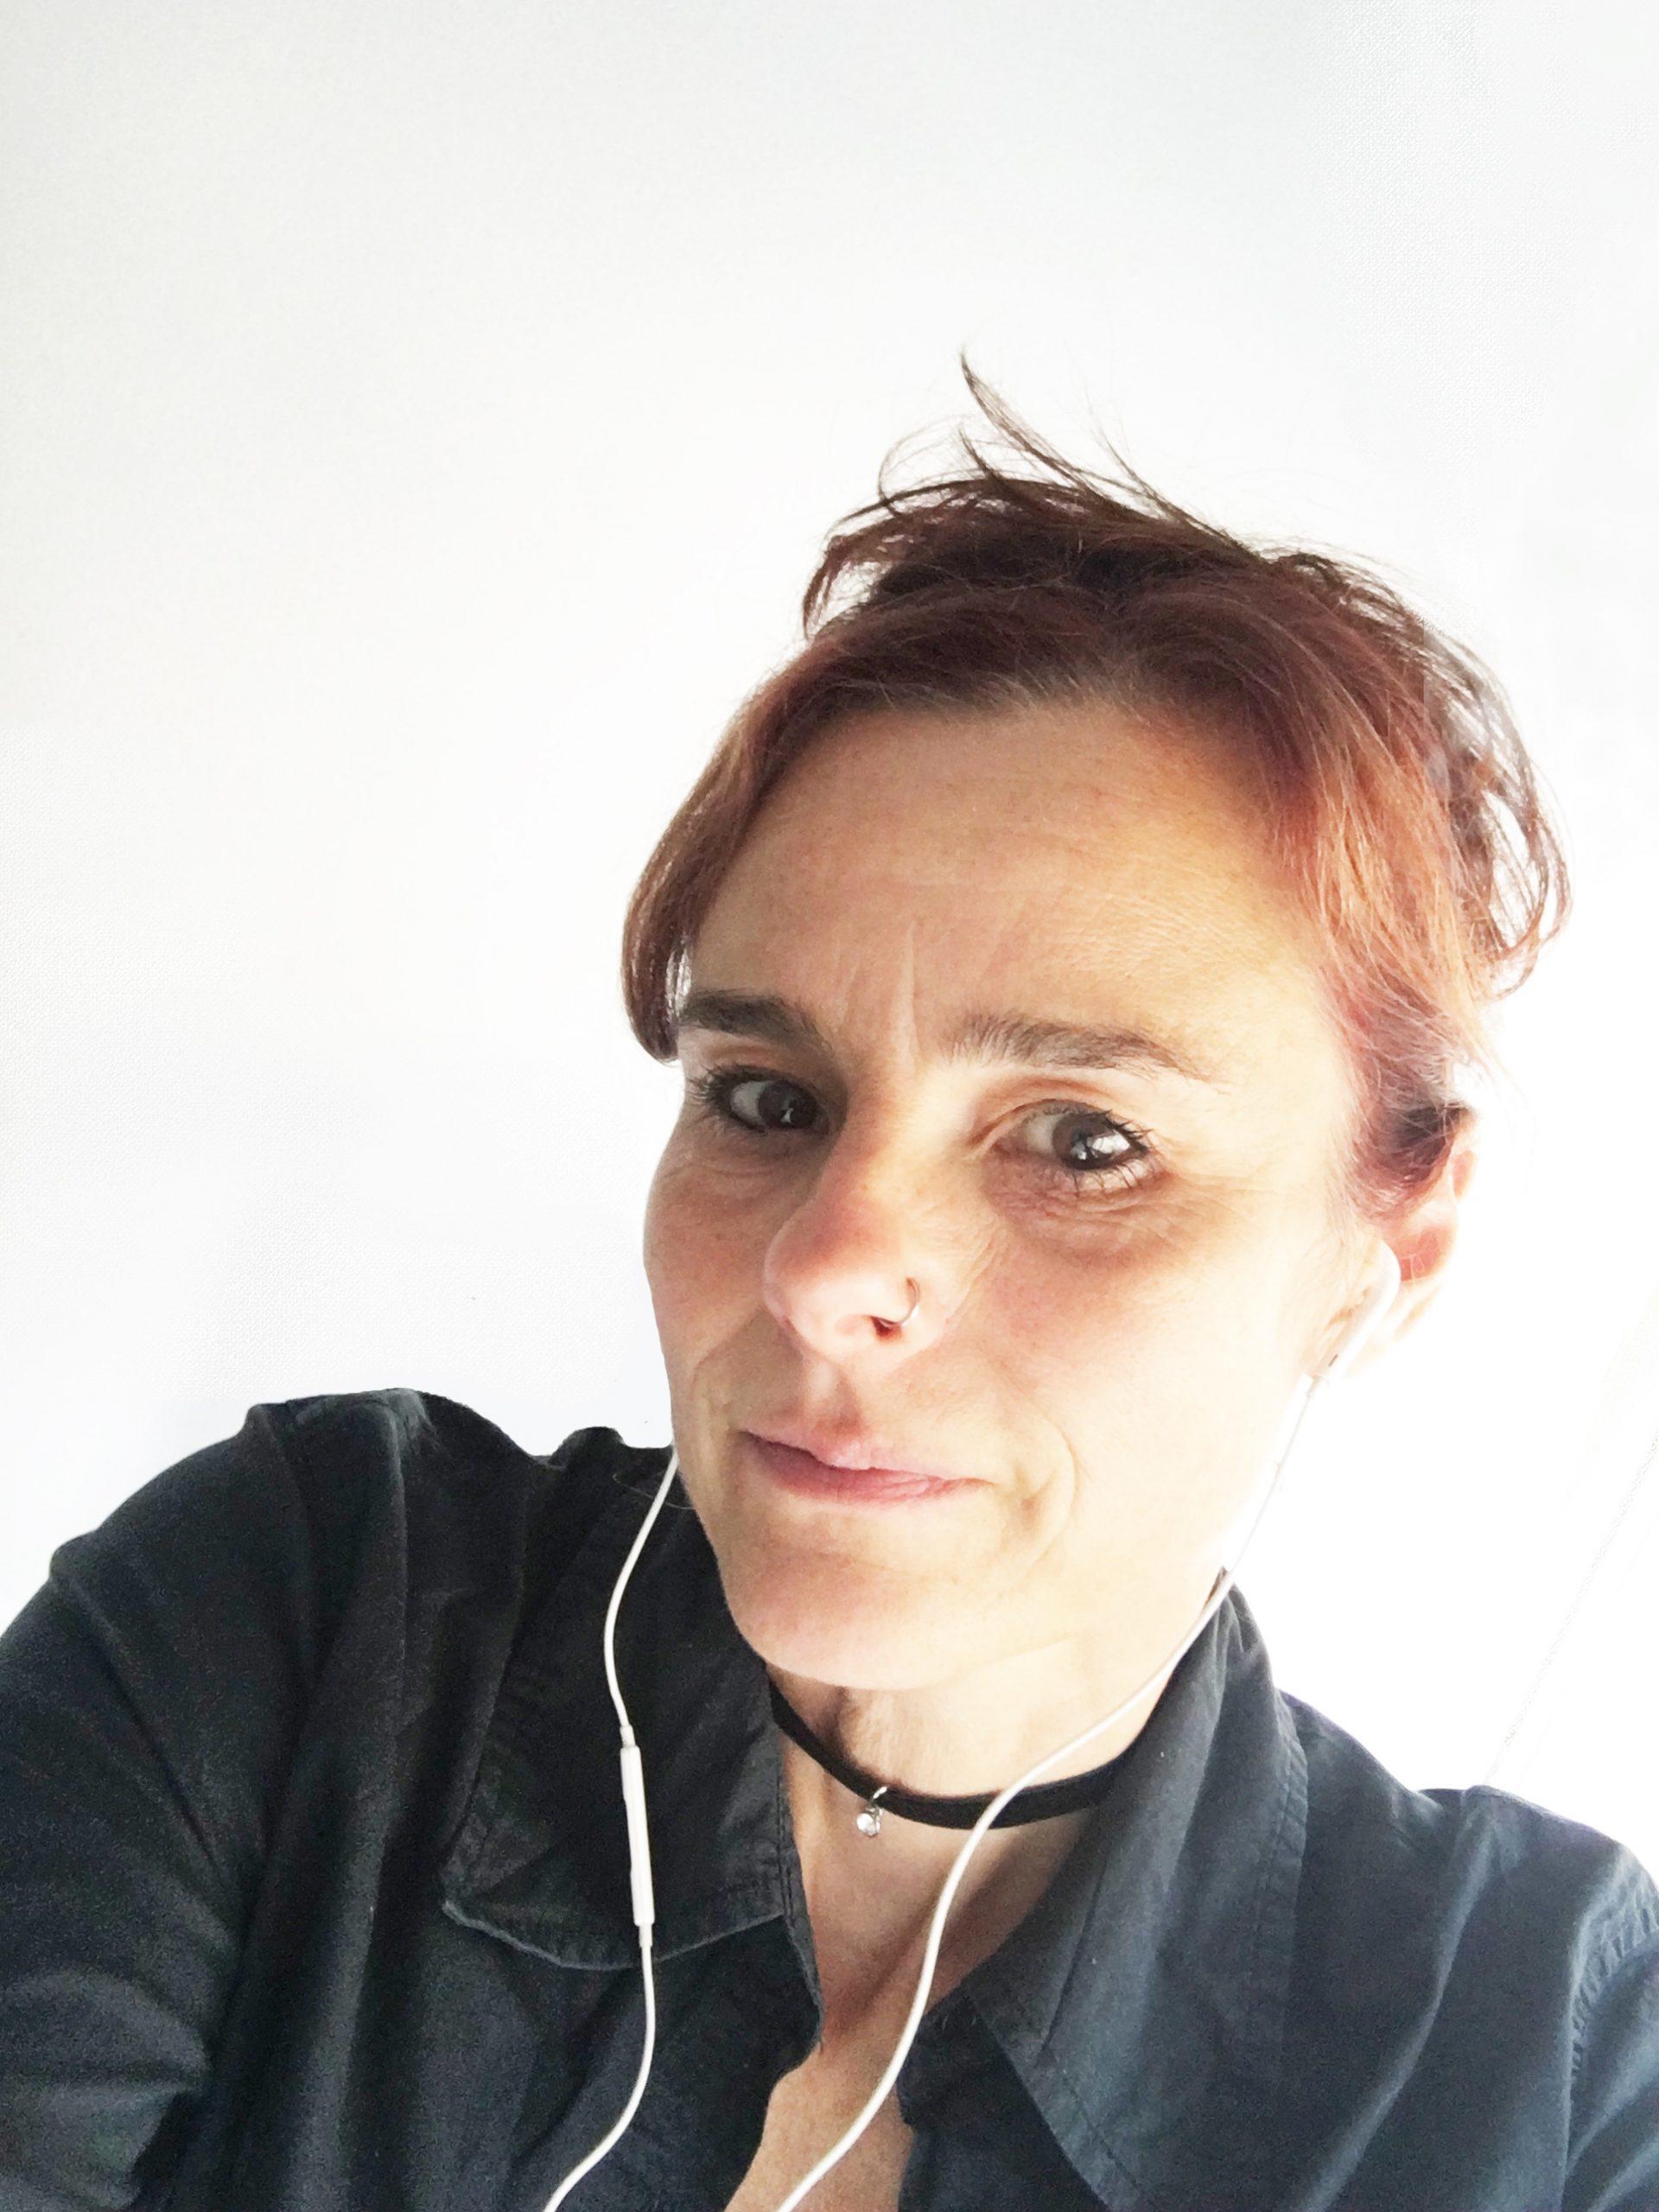 Caryl Portrait